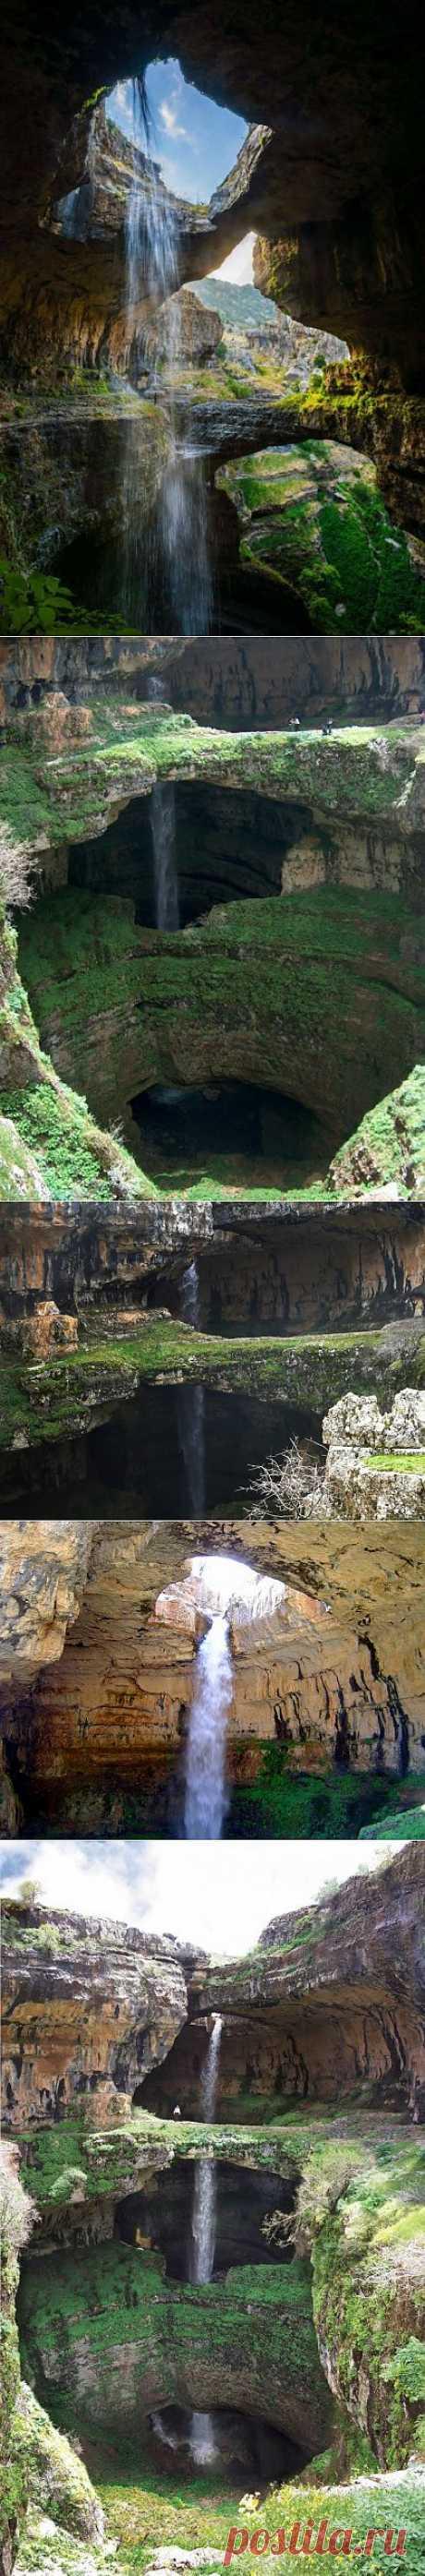 Фантастический водопад Баатара в Ливане | ТУРИЗМ И ОТДЫХ